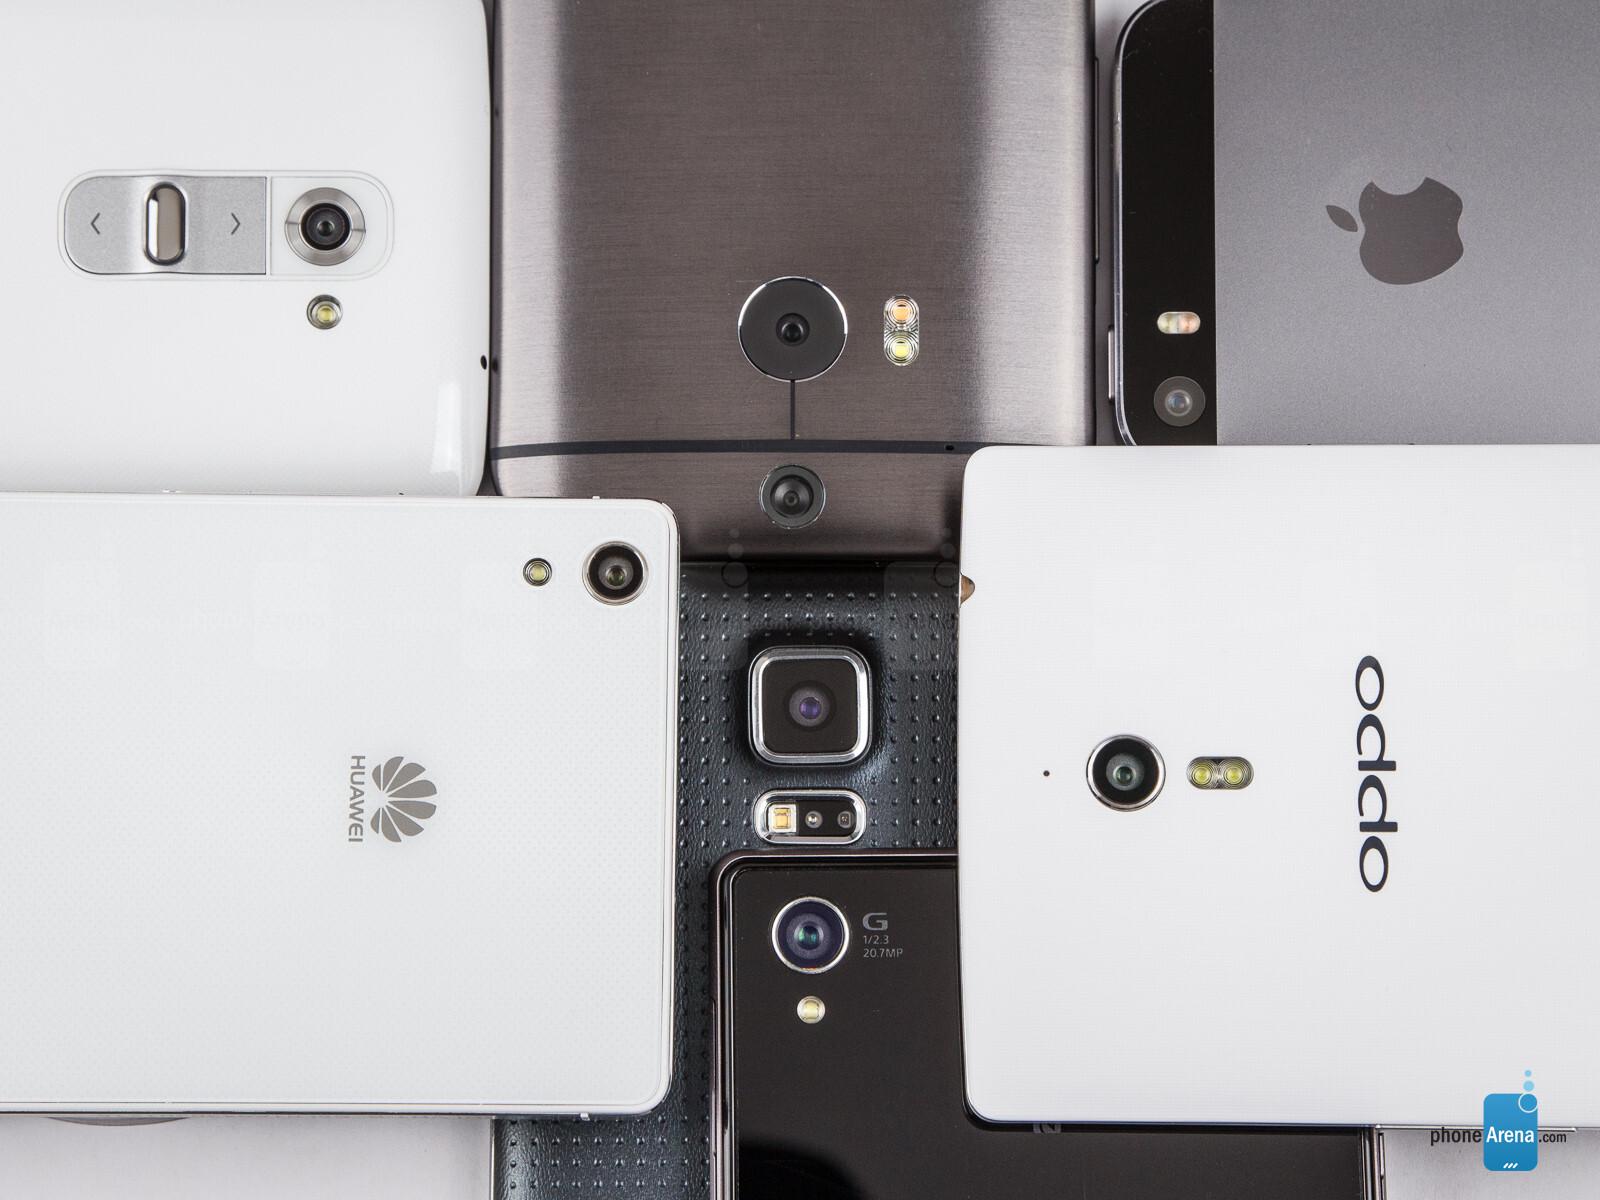 Camera comparison: Huawei Ascend P7 and Oppo Find 7a vs ...